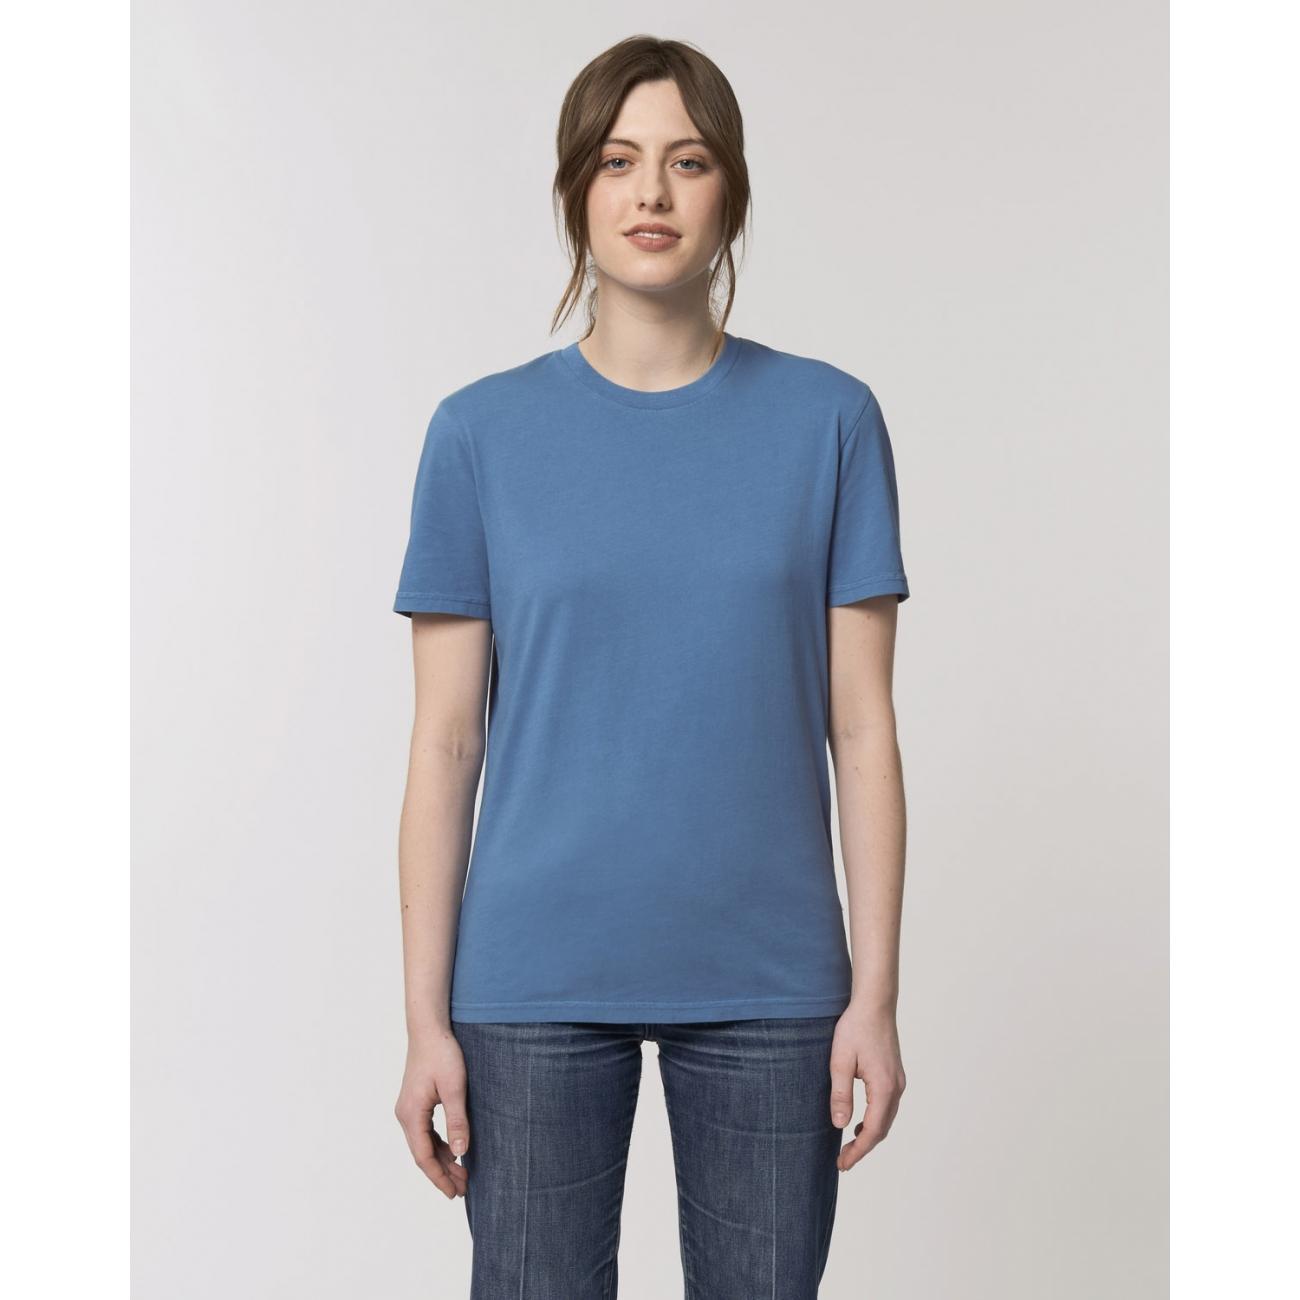 https://tee-shirt-bio.com/8687-thickbox_default/tee-shirt-bleu-cadet-delave-coton-bio-creator-vintage.jpg